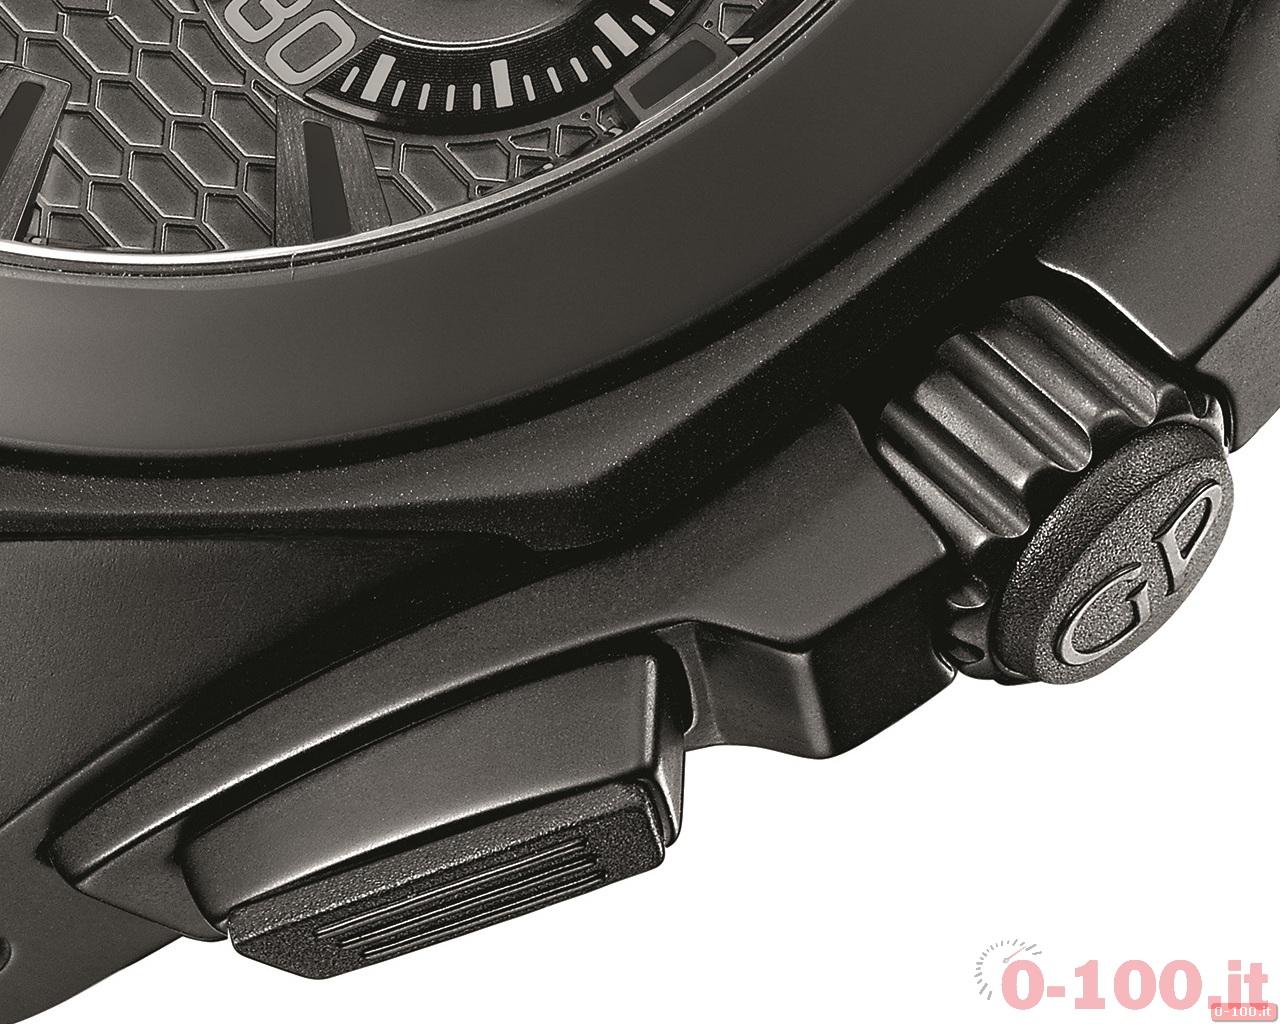 girard-perregaux-shadow-hawk-limited-edition-ref-49970-32-635-fk6a-family-nile-rodgers-0-100_5